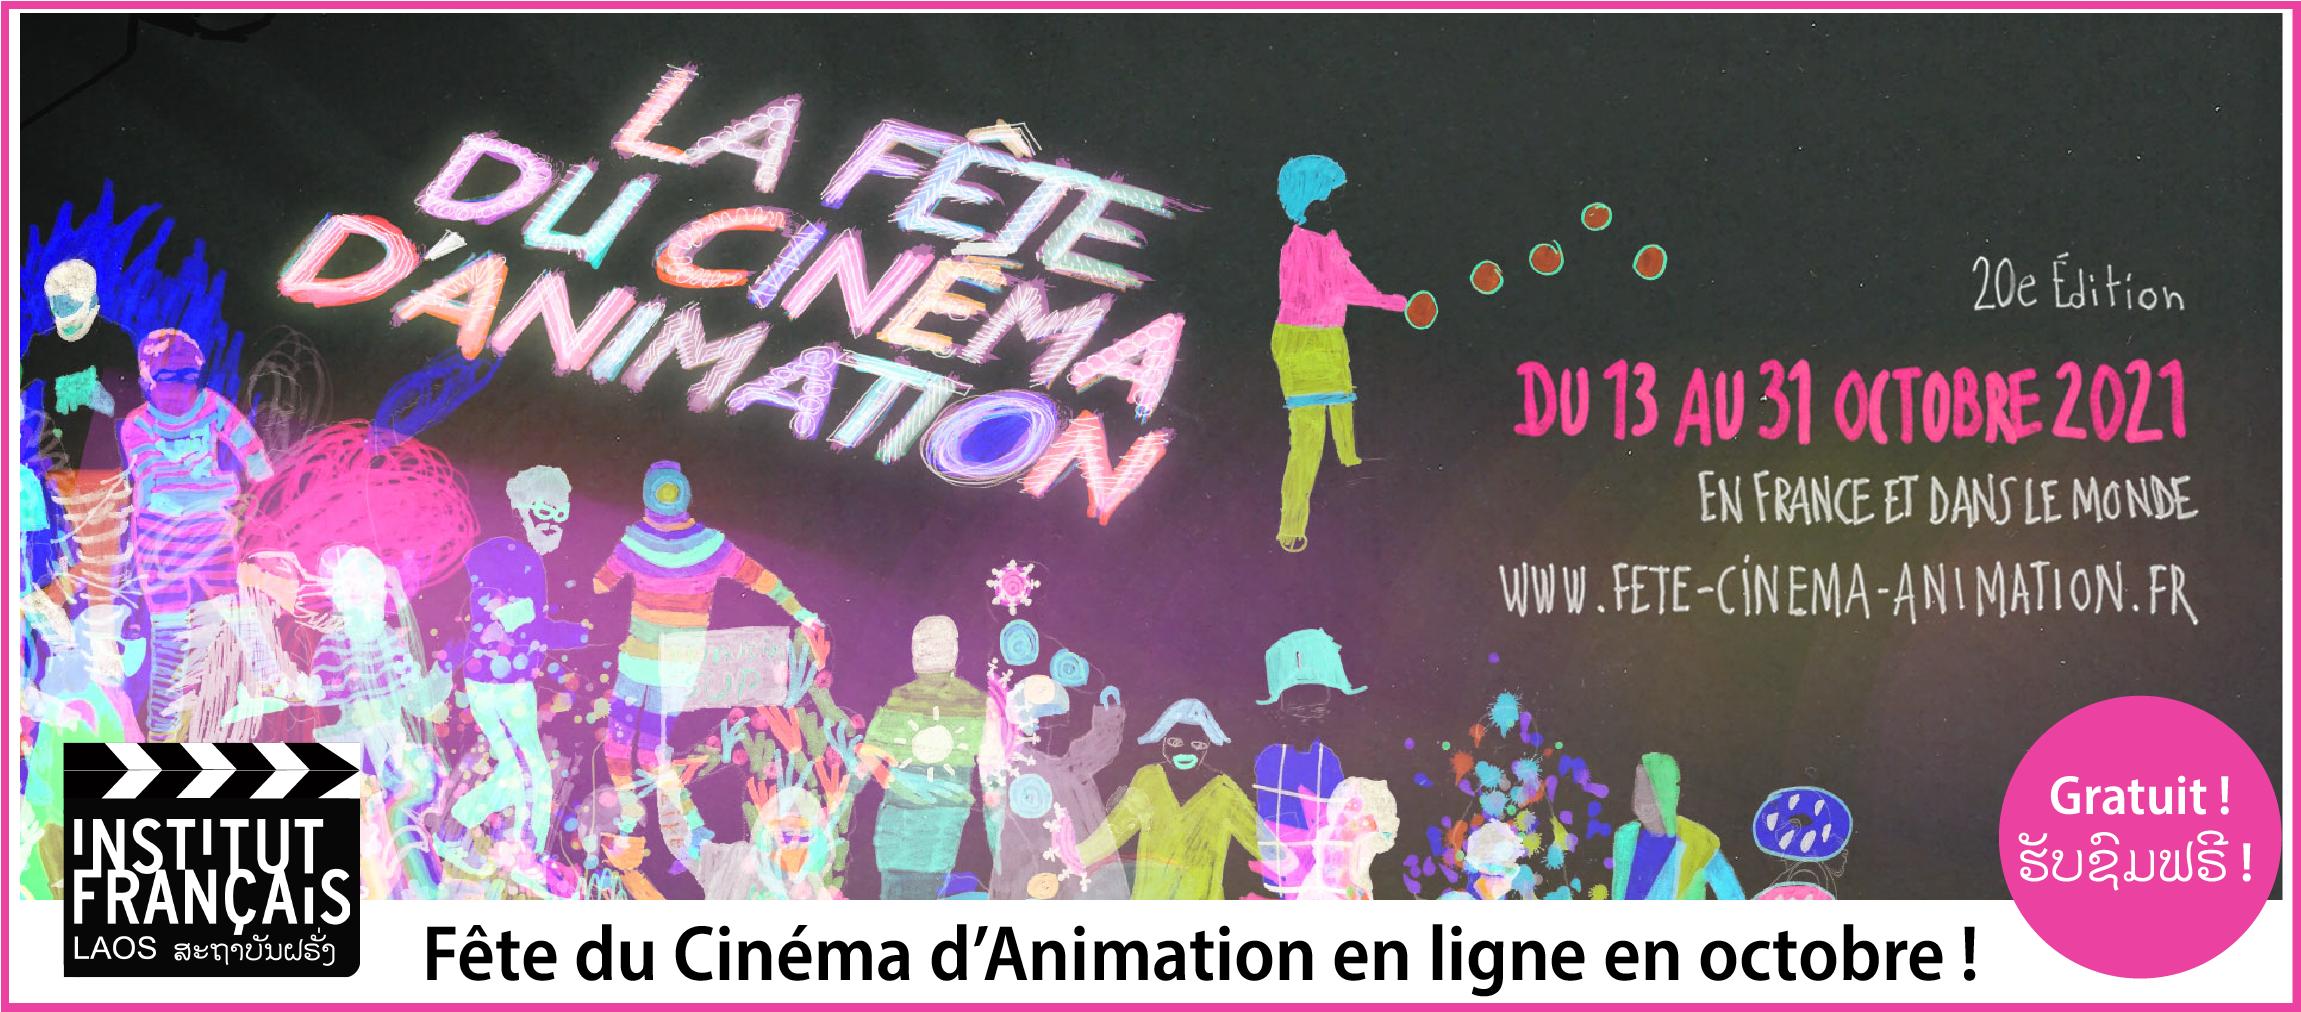 FILMS | IFCINEMA A LA CARTE | ANIMATION FILM FESTIVAL